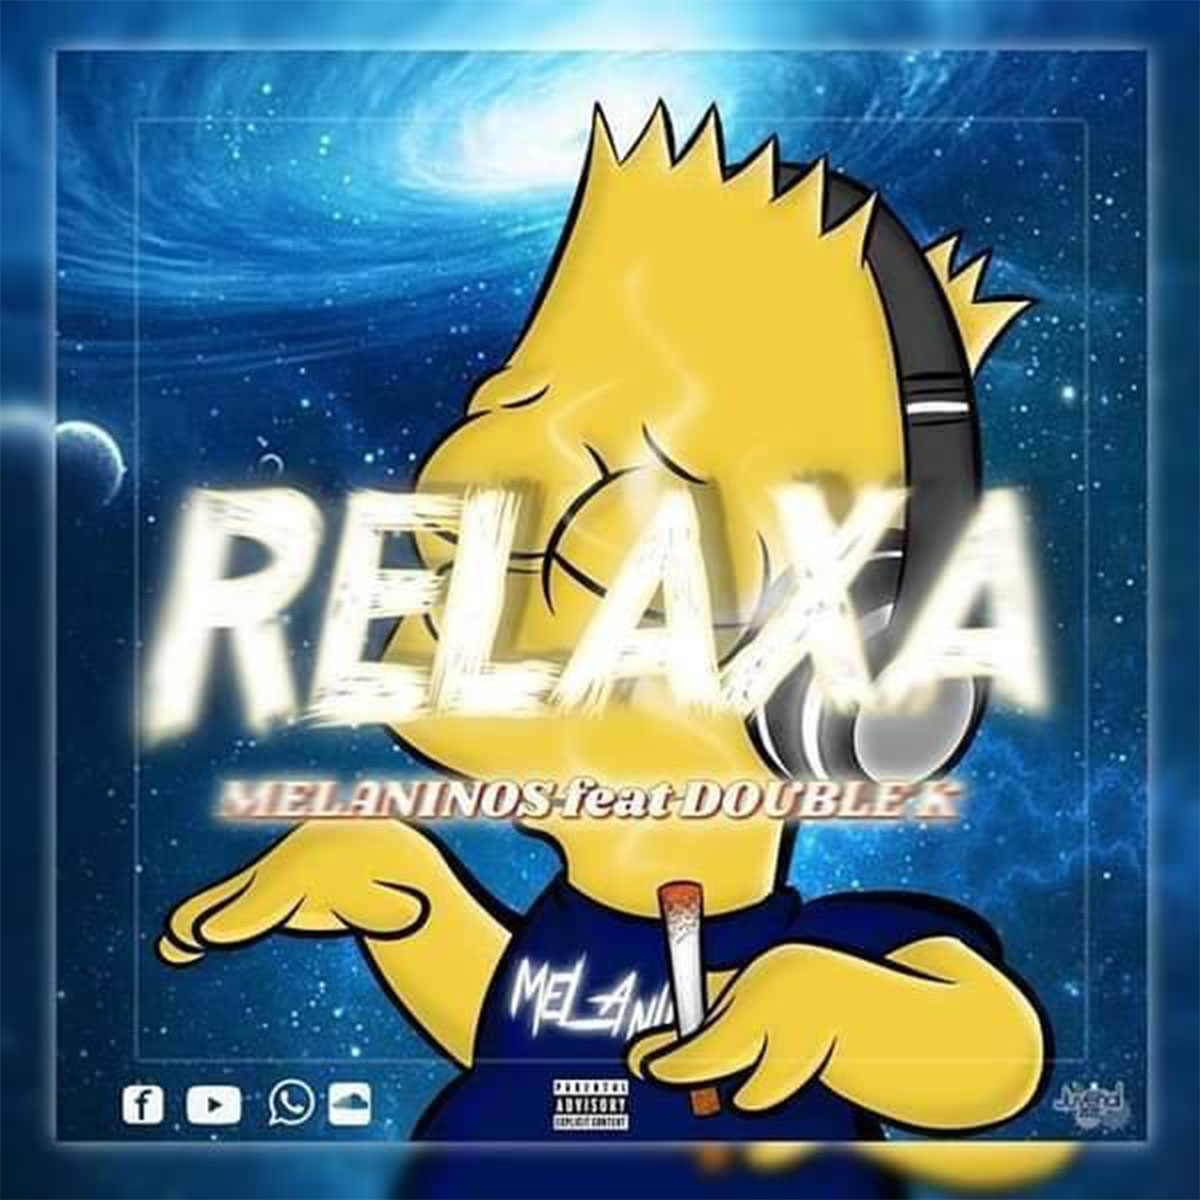 Melaninos - Relaxa (feat. Double K)